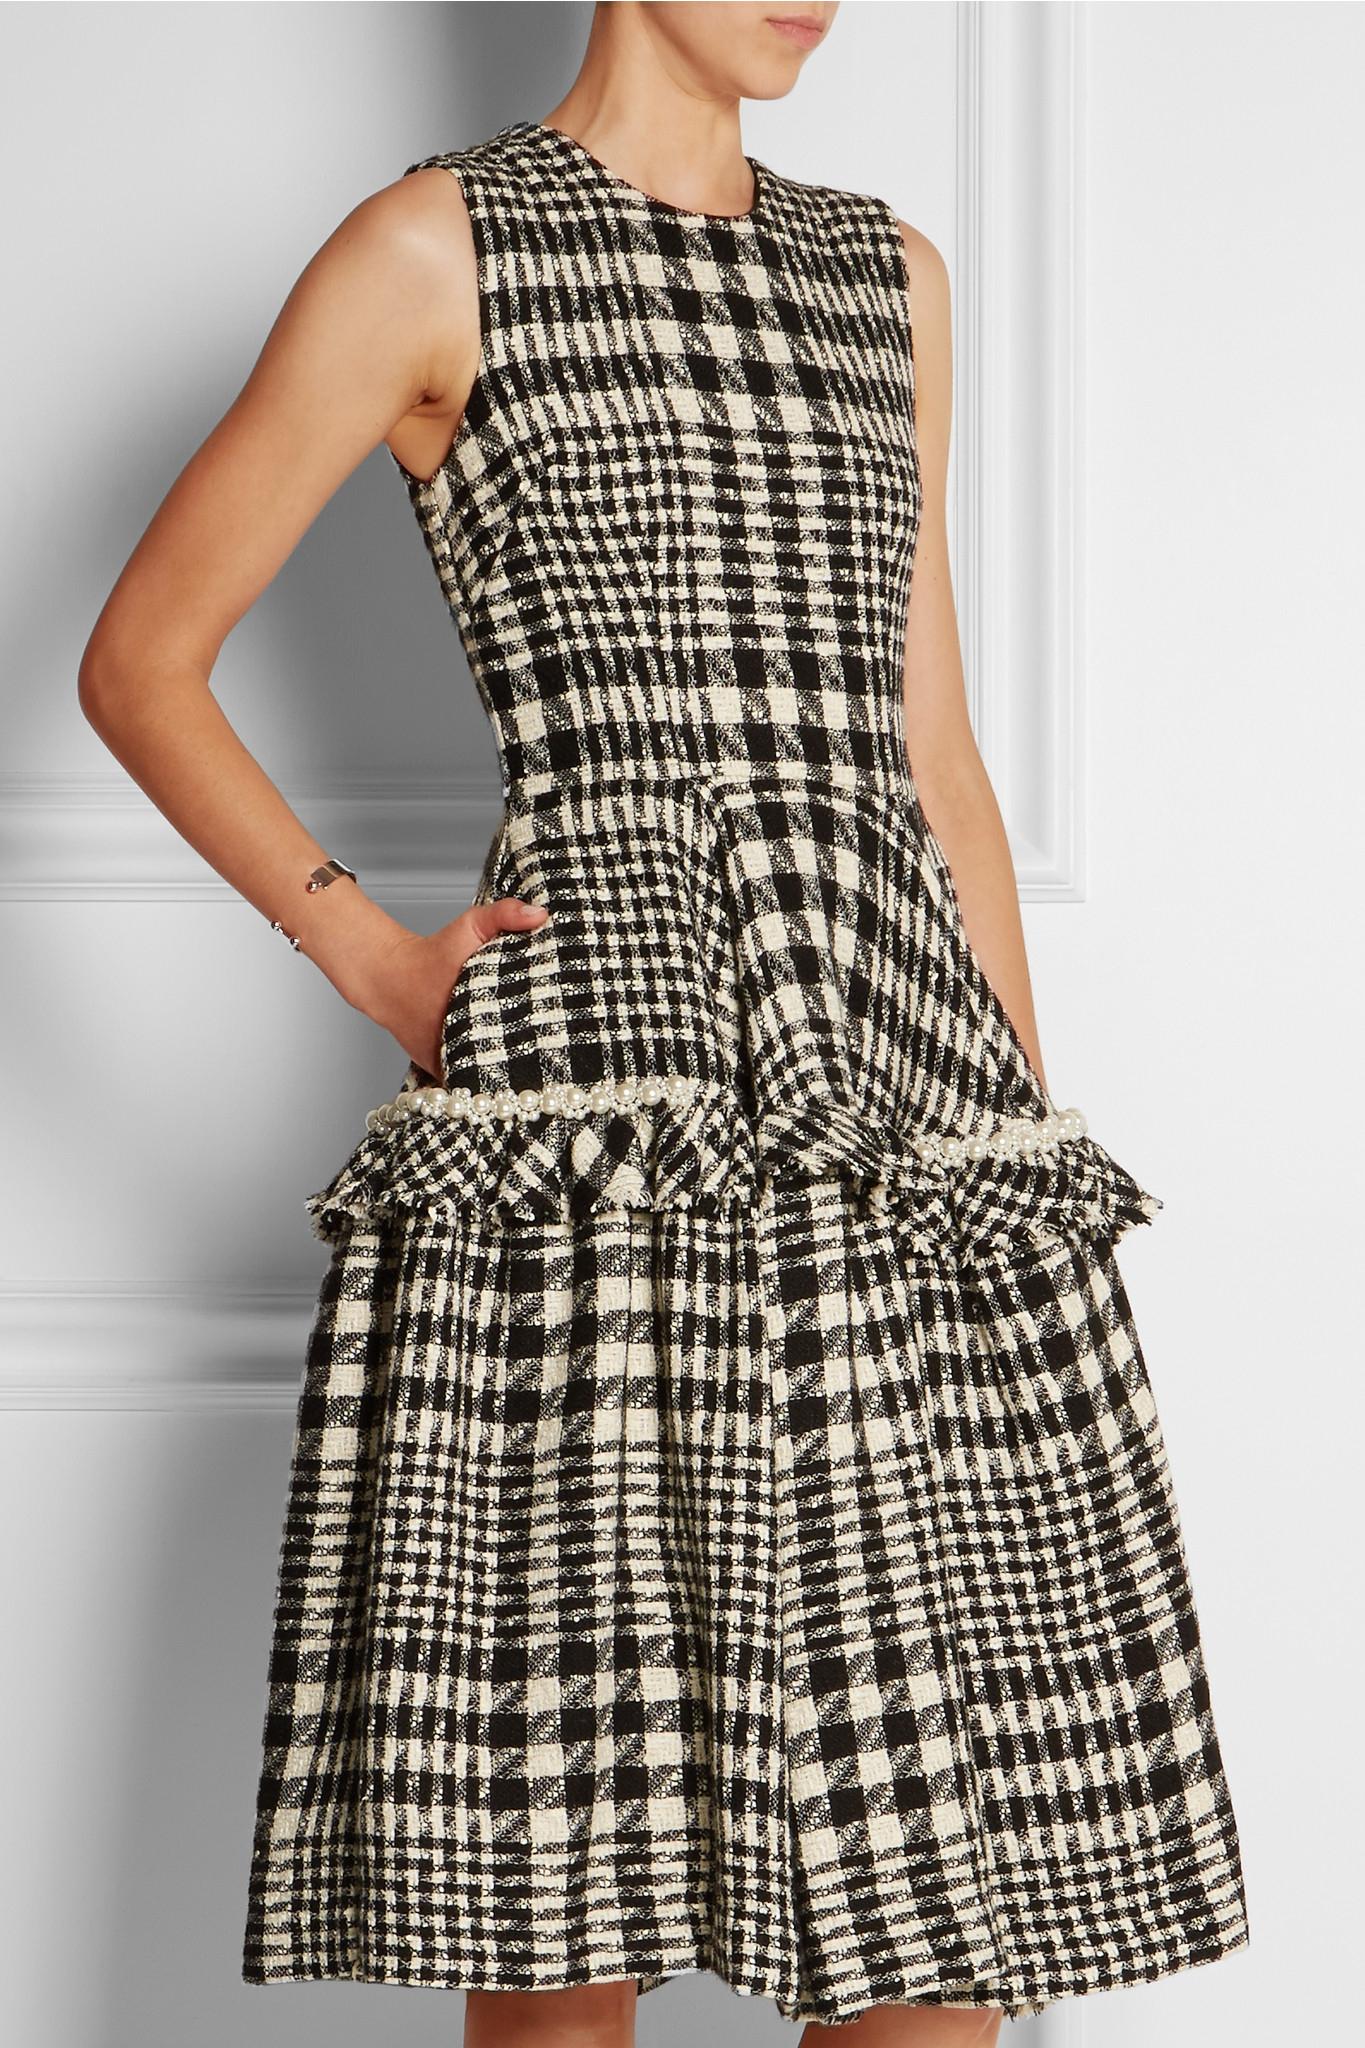 Simone rocha Faux Pearl-embellished Plaid Bouclé-tweed ...